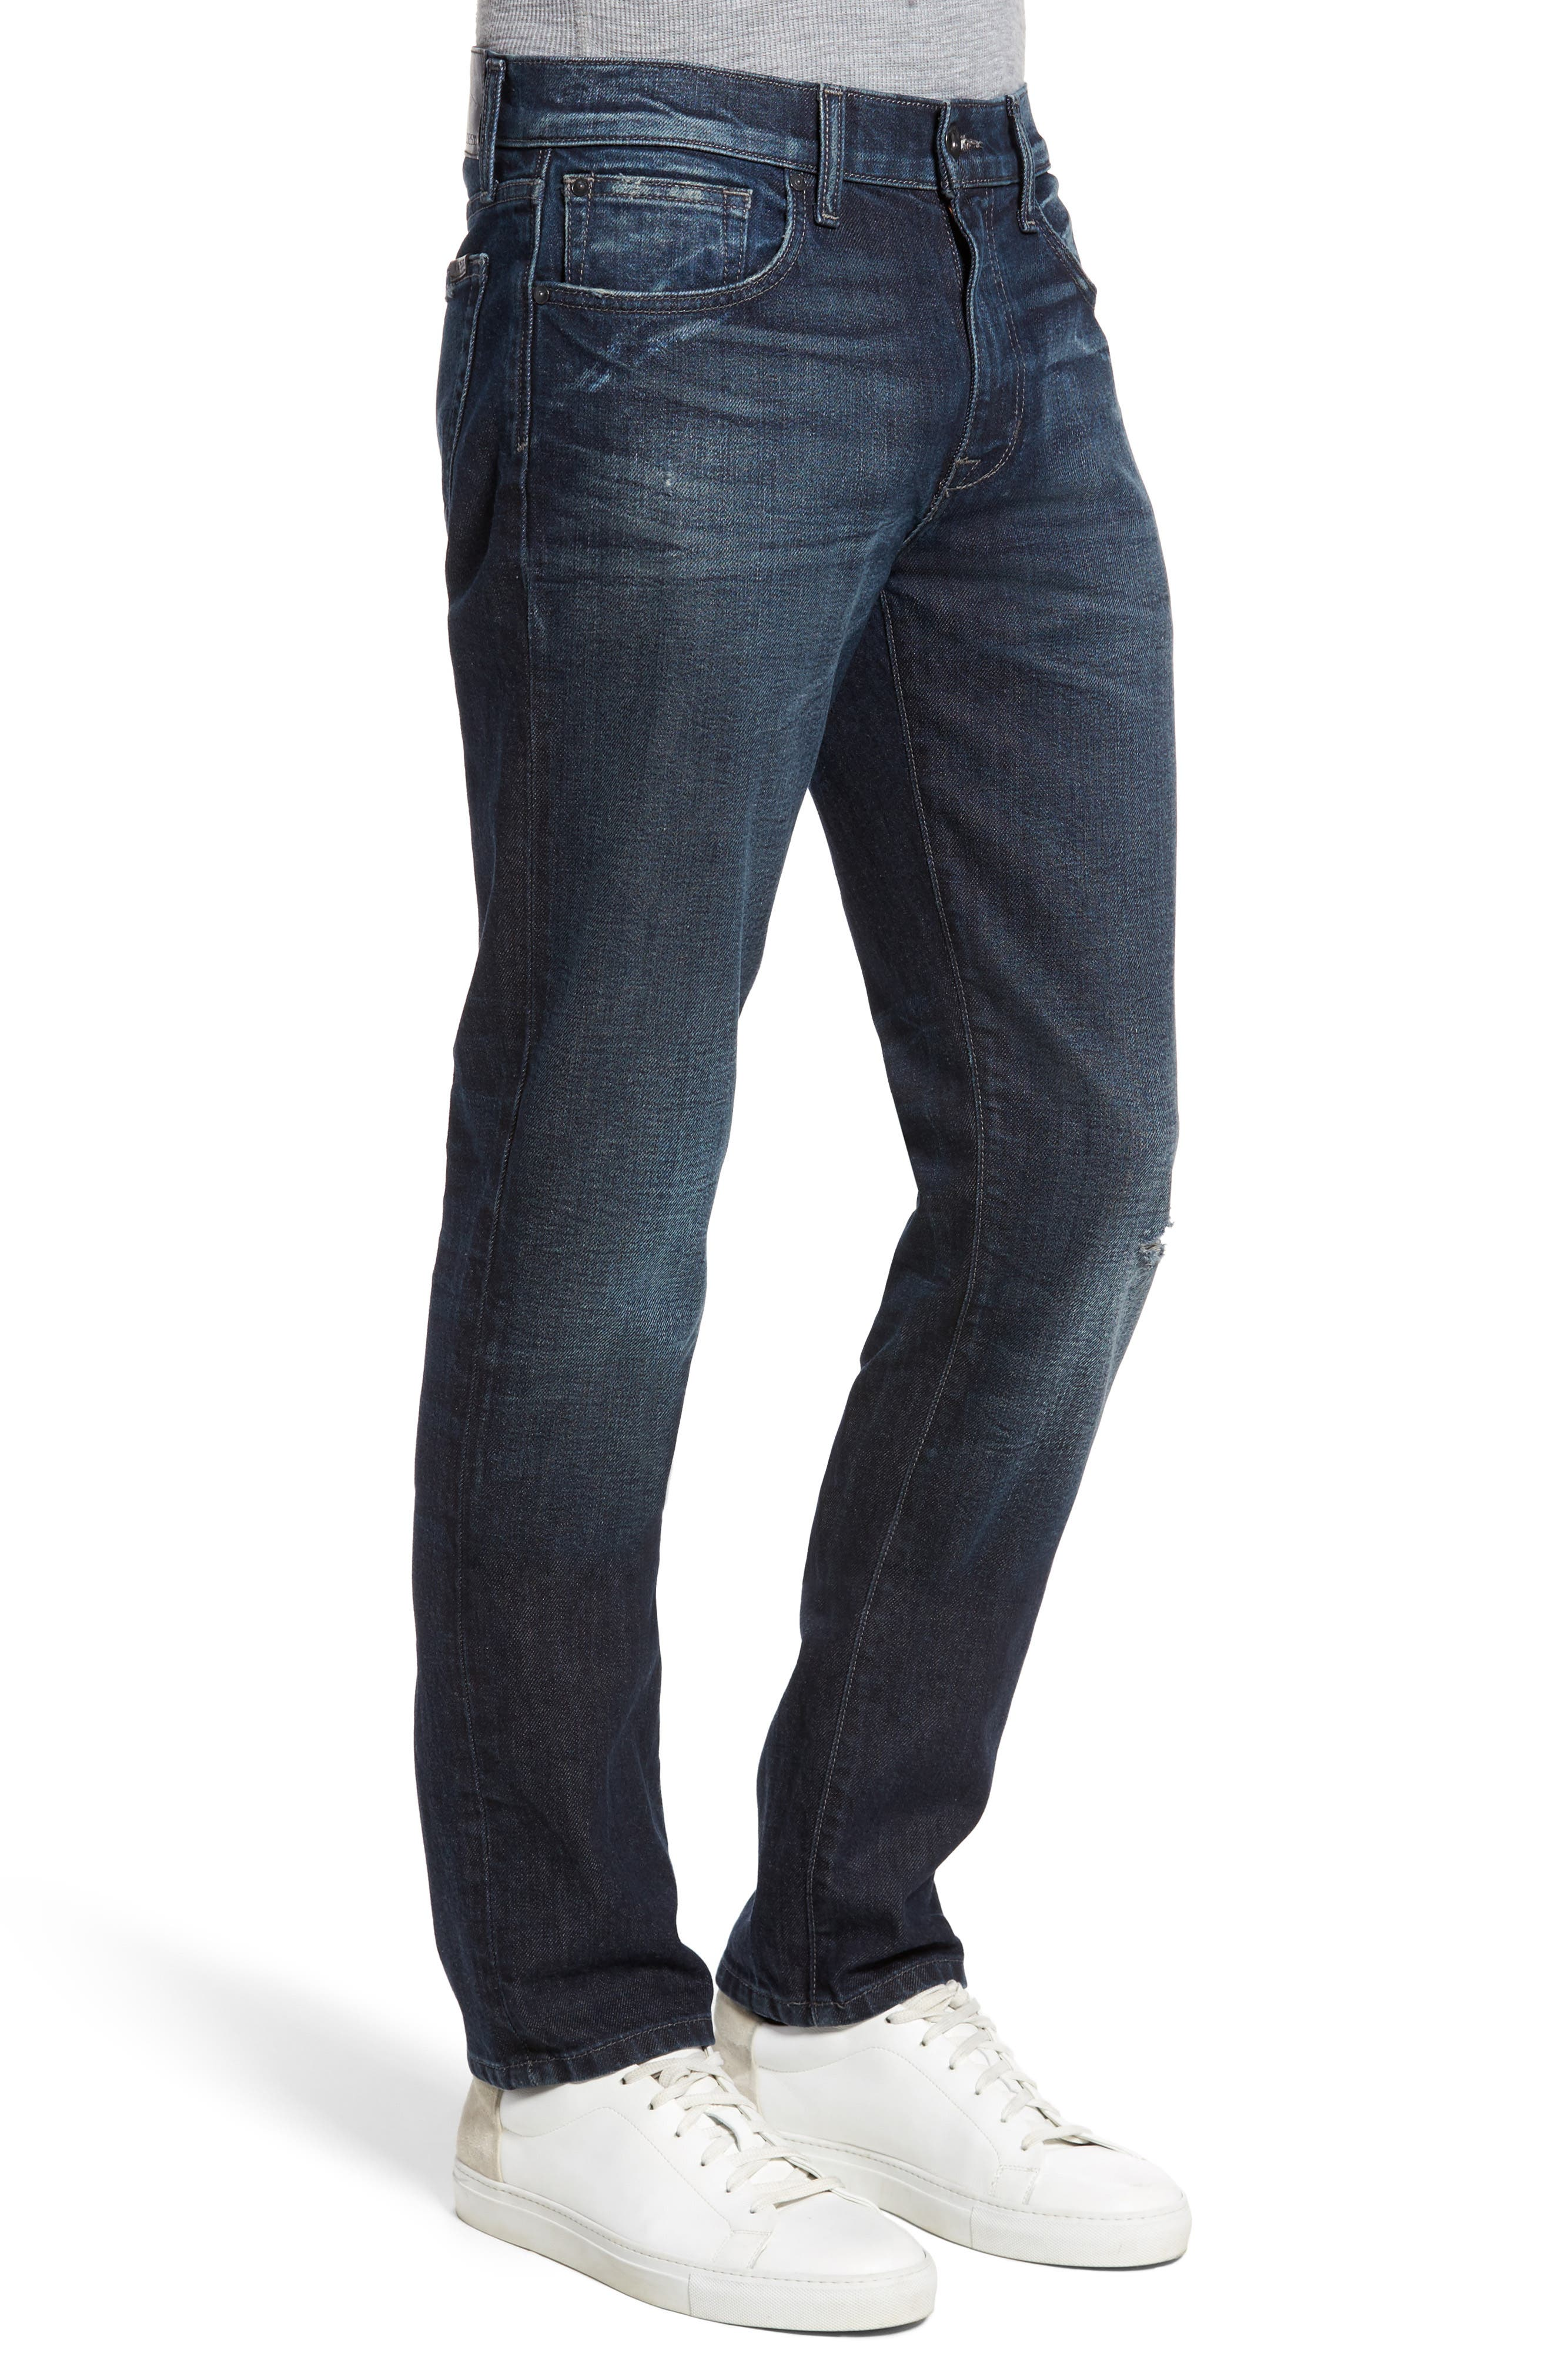 Brixton Slim Straight Leg Jeans,                             Alternate thumbnail 3, color,                             415